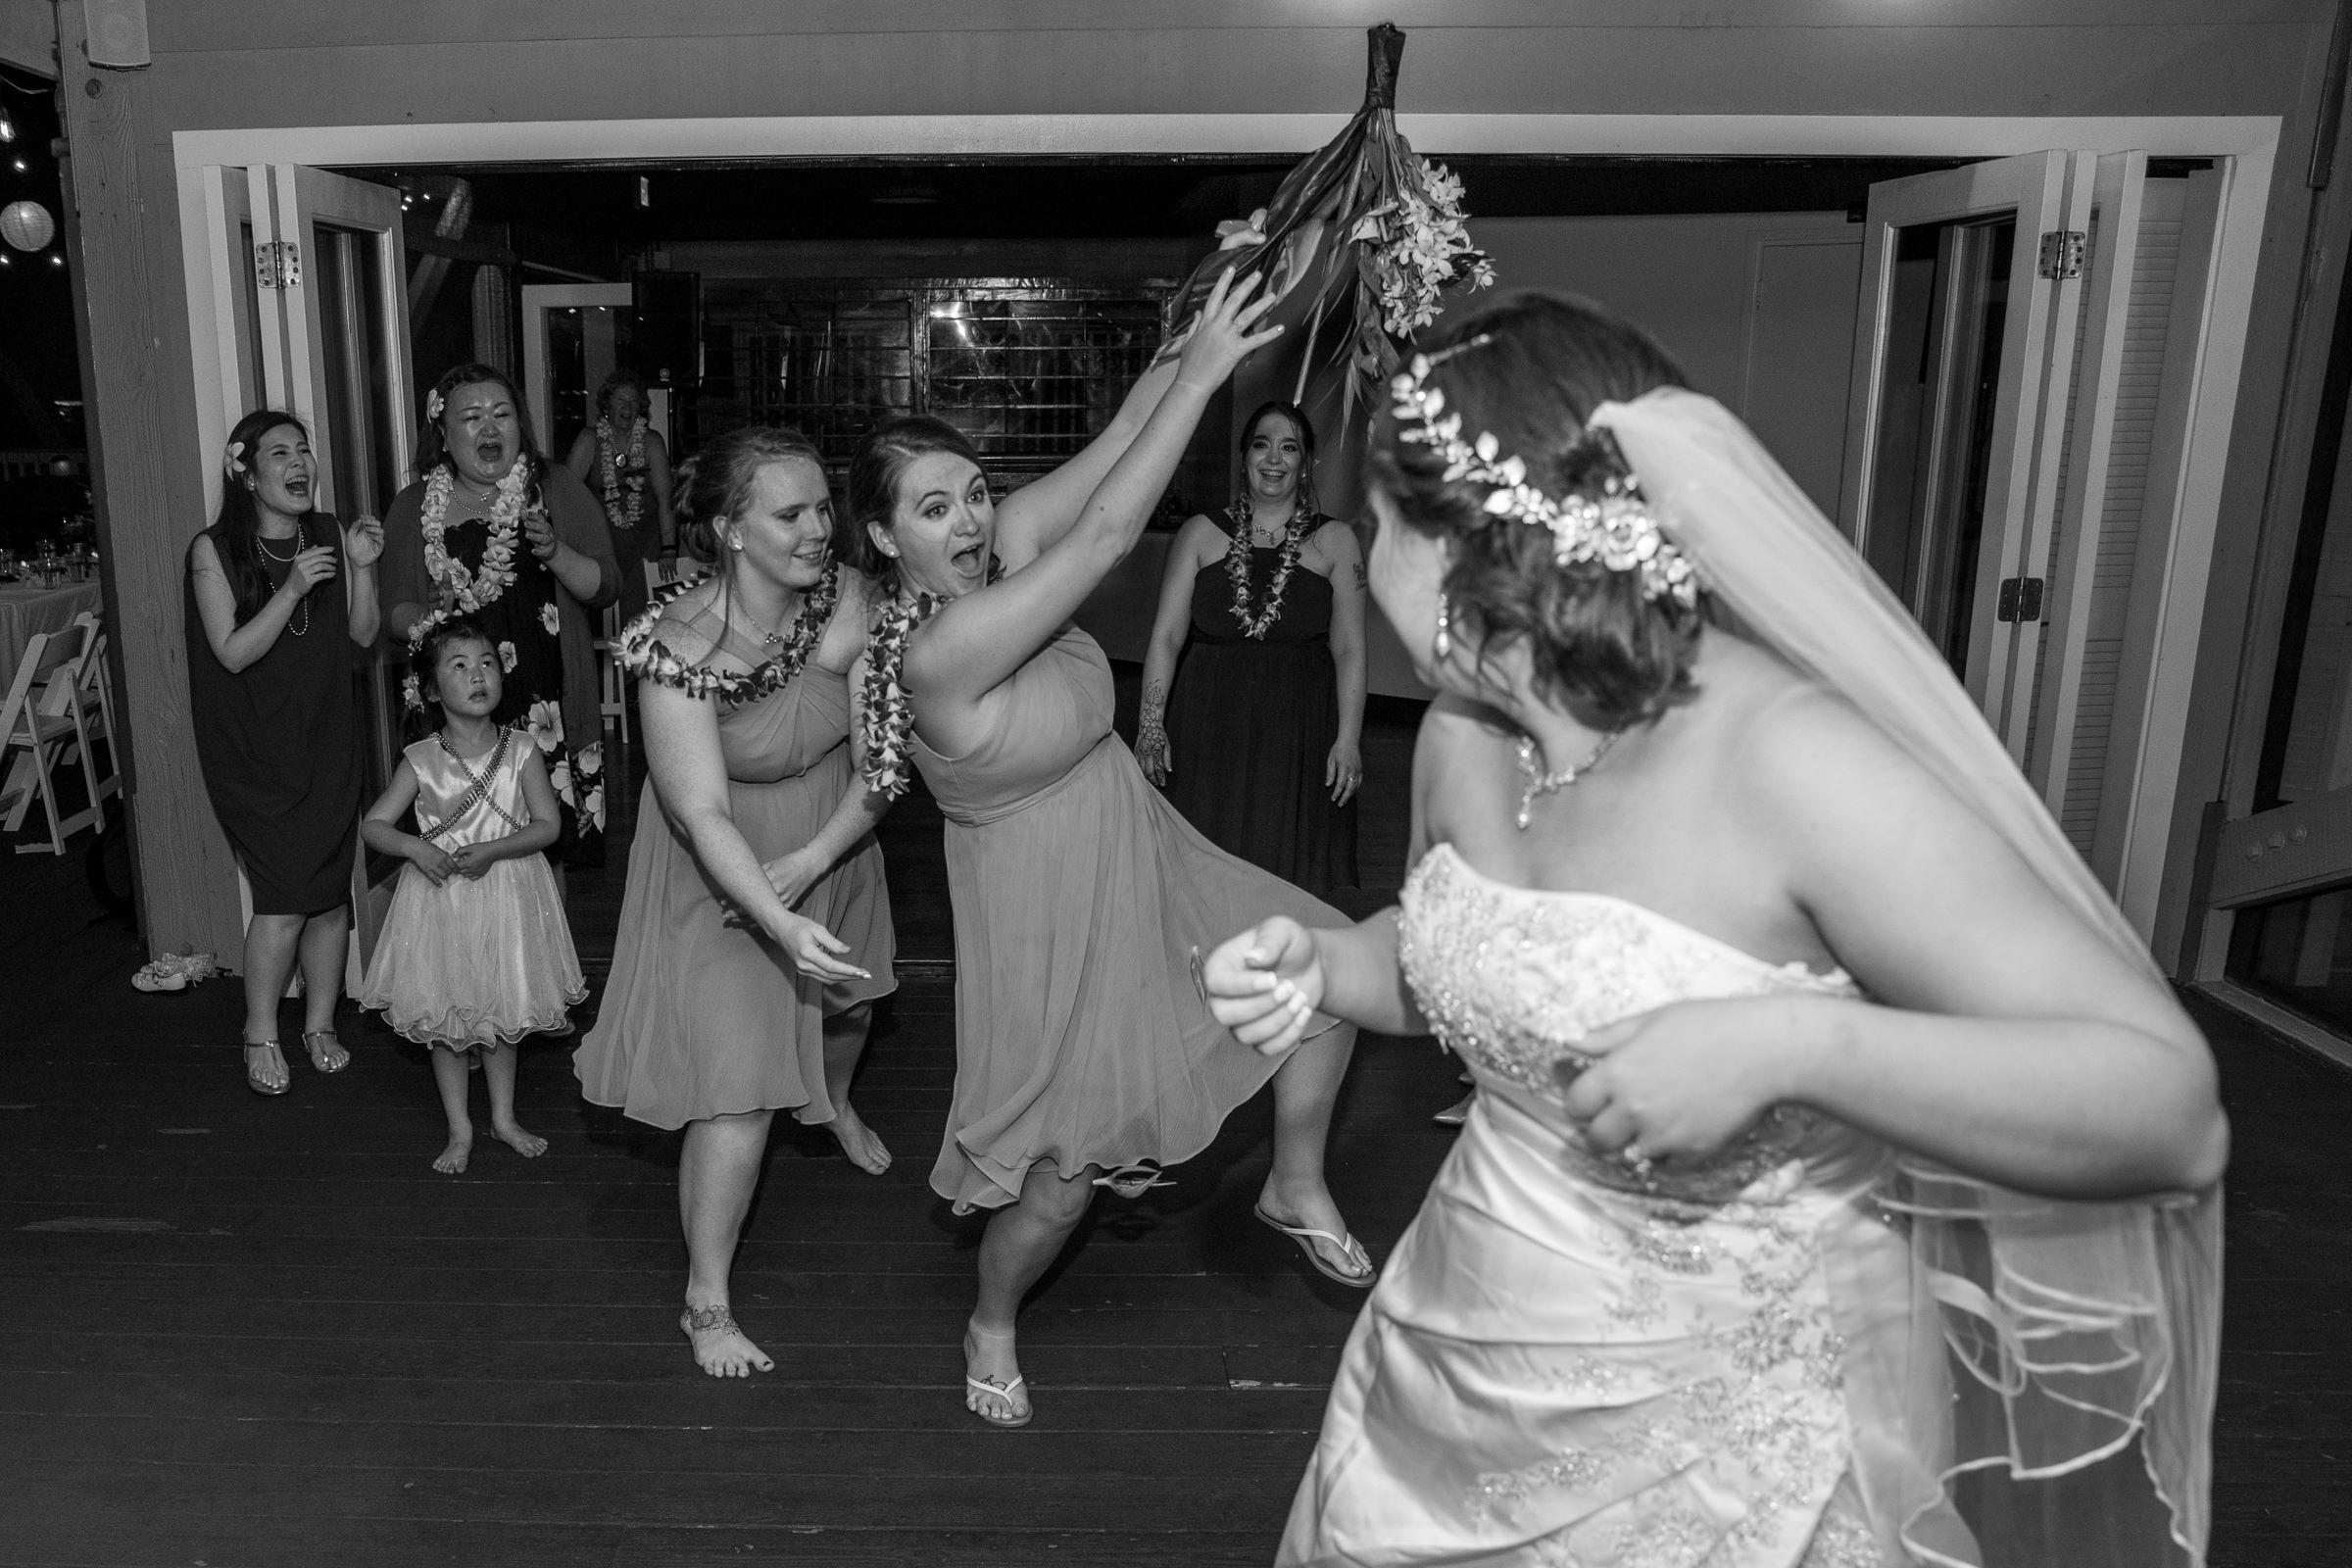 wedding-photographer-photography-destination-hawaii-lake-tahoe-reception-boquet-toss